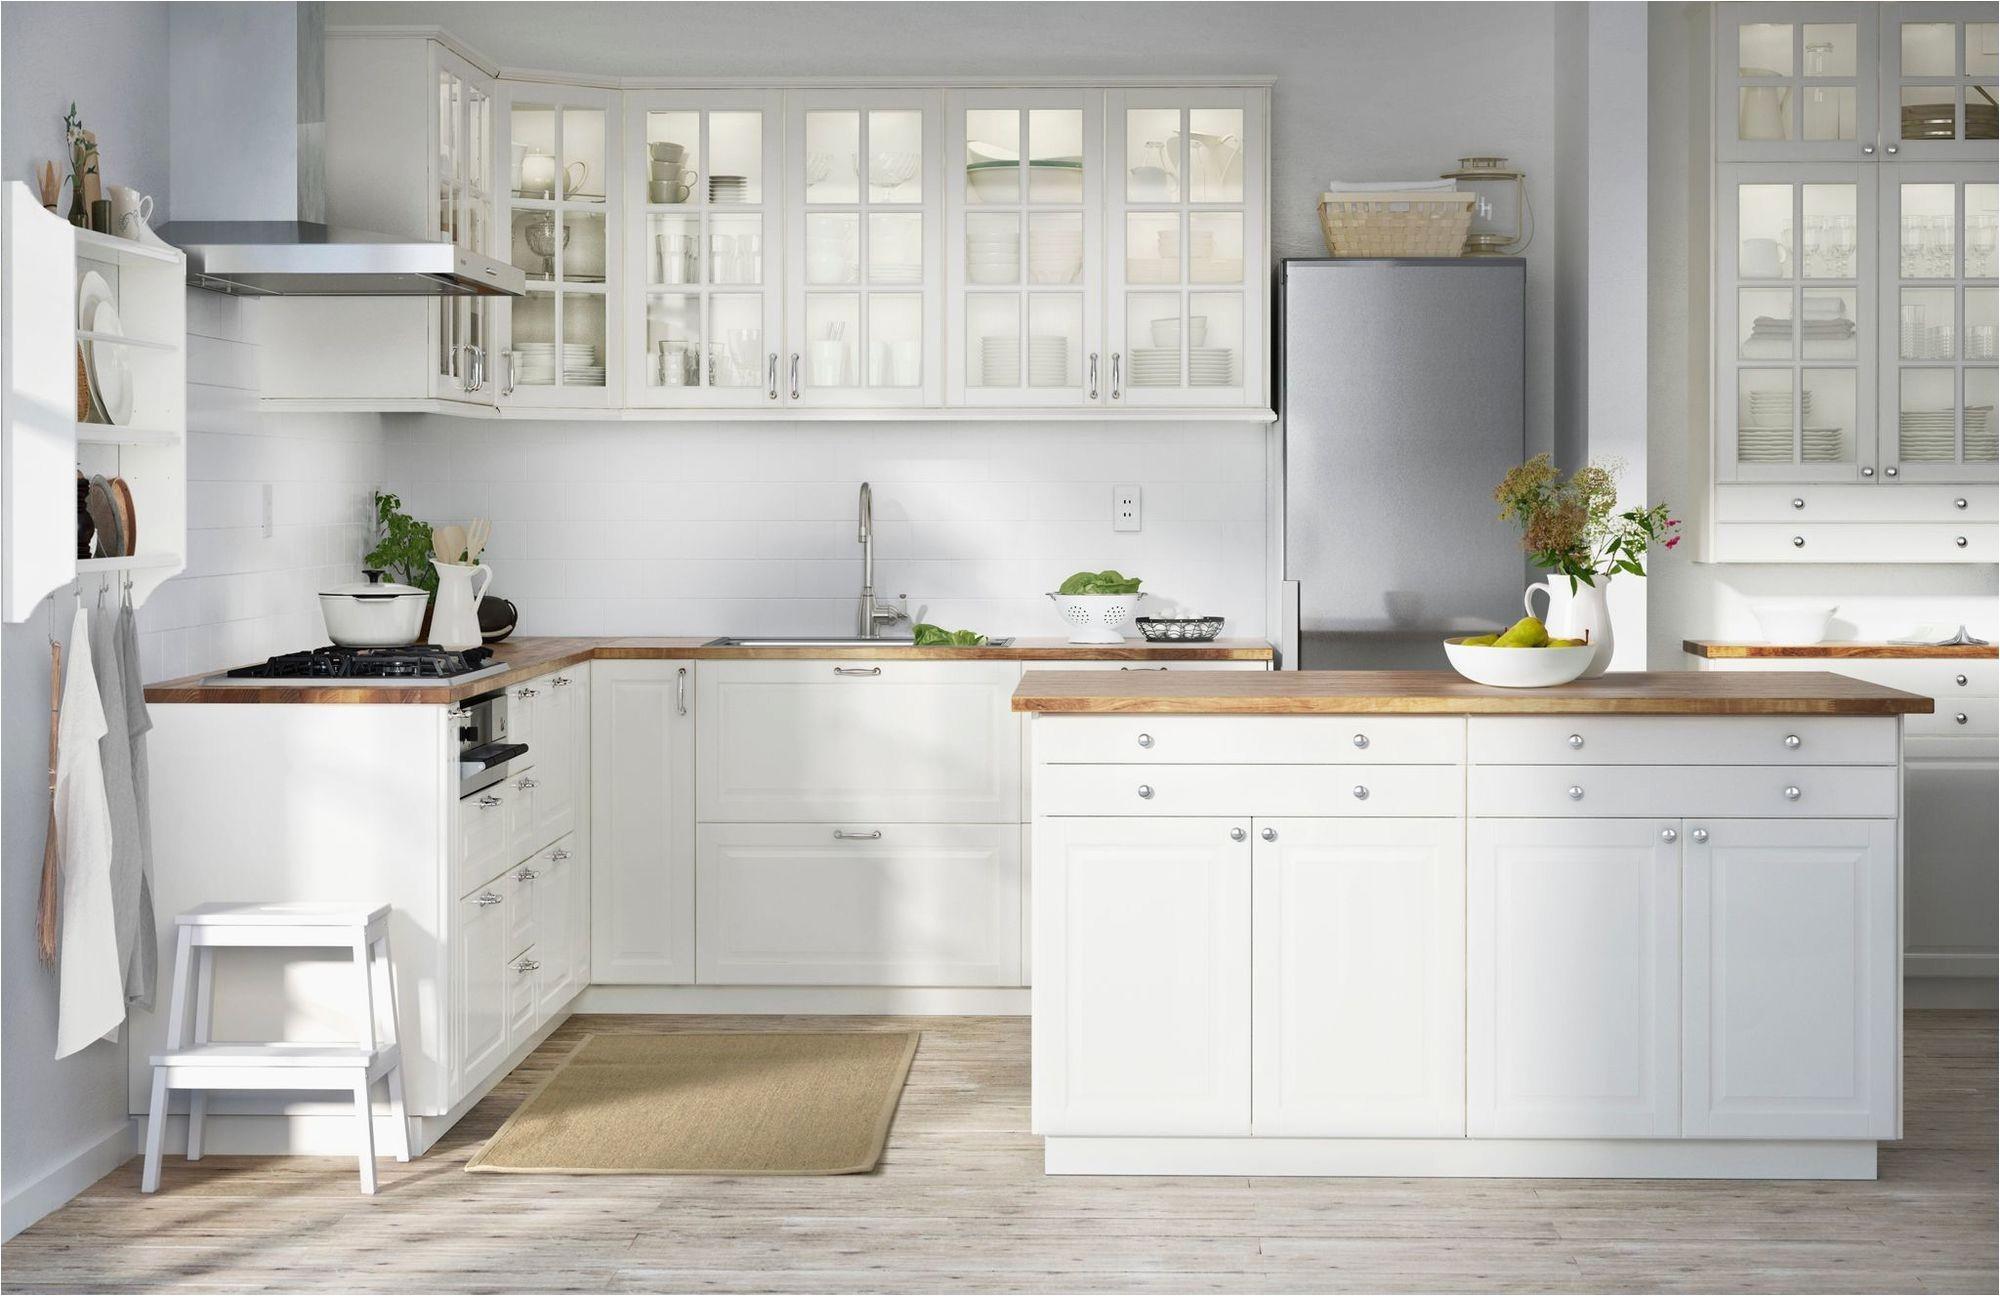 Cuisine Ikea Ringhult Blanc Brillant Avis Impressionnant Galerie 30 Meilleur De Ikea Cuisine 3d Belgique